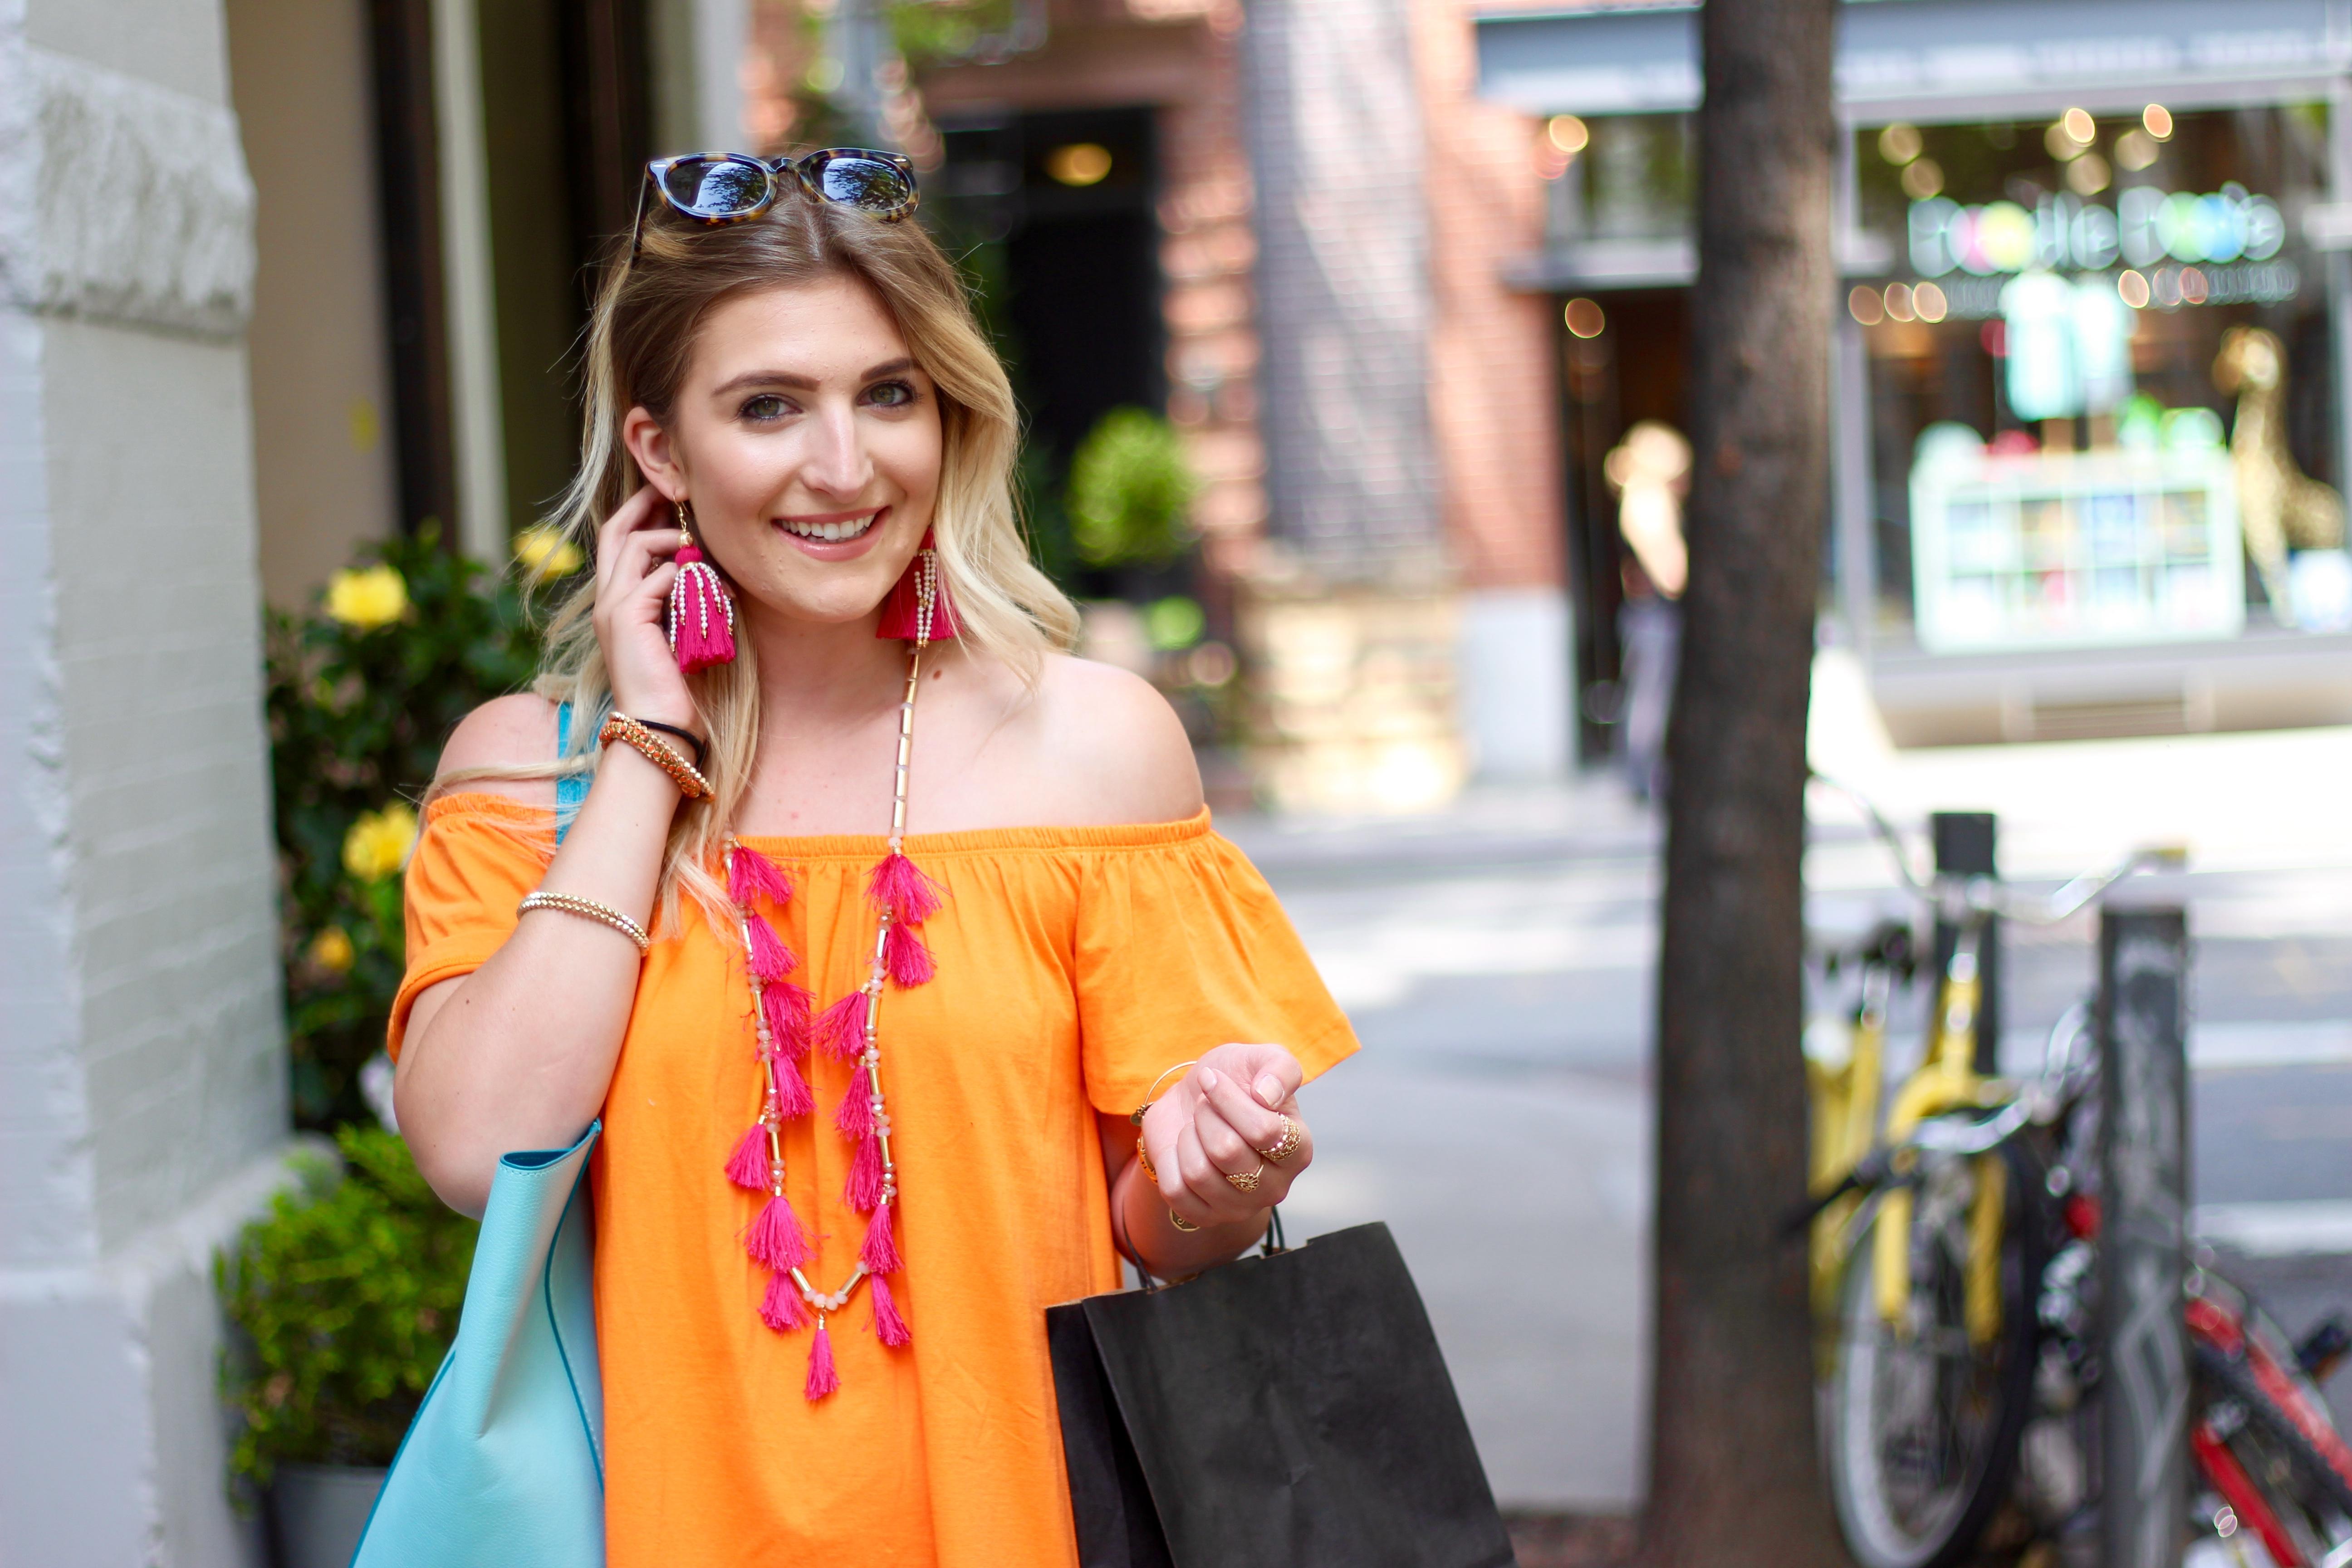 affordable tassel earrings in soho | Audrey Madison Stowe Blog